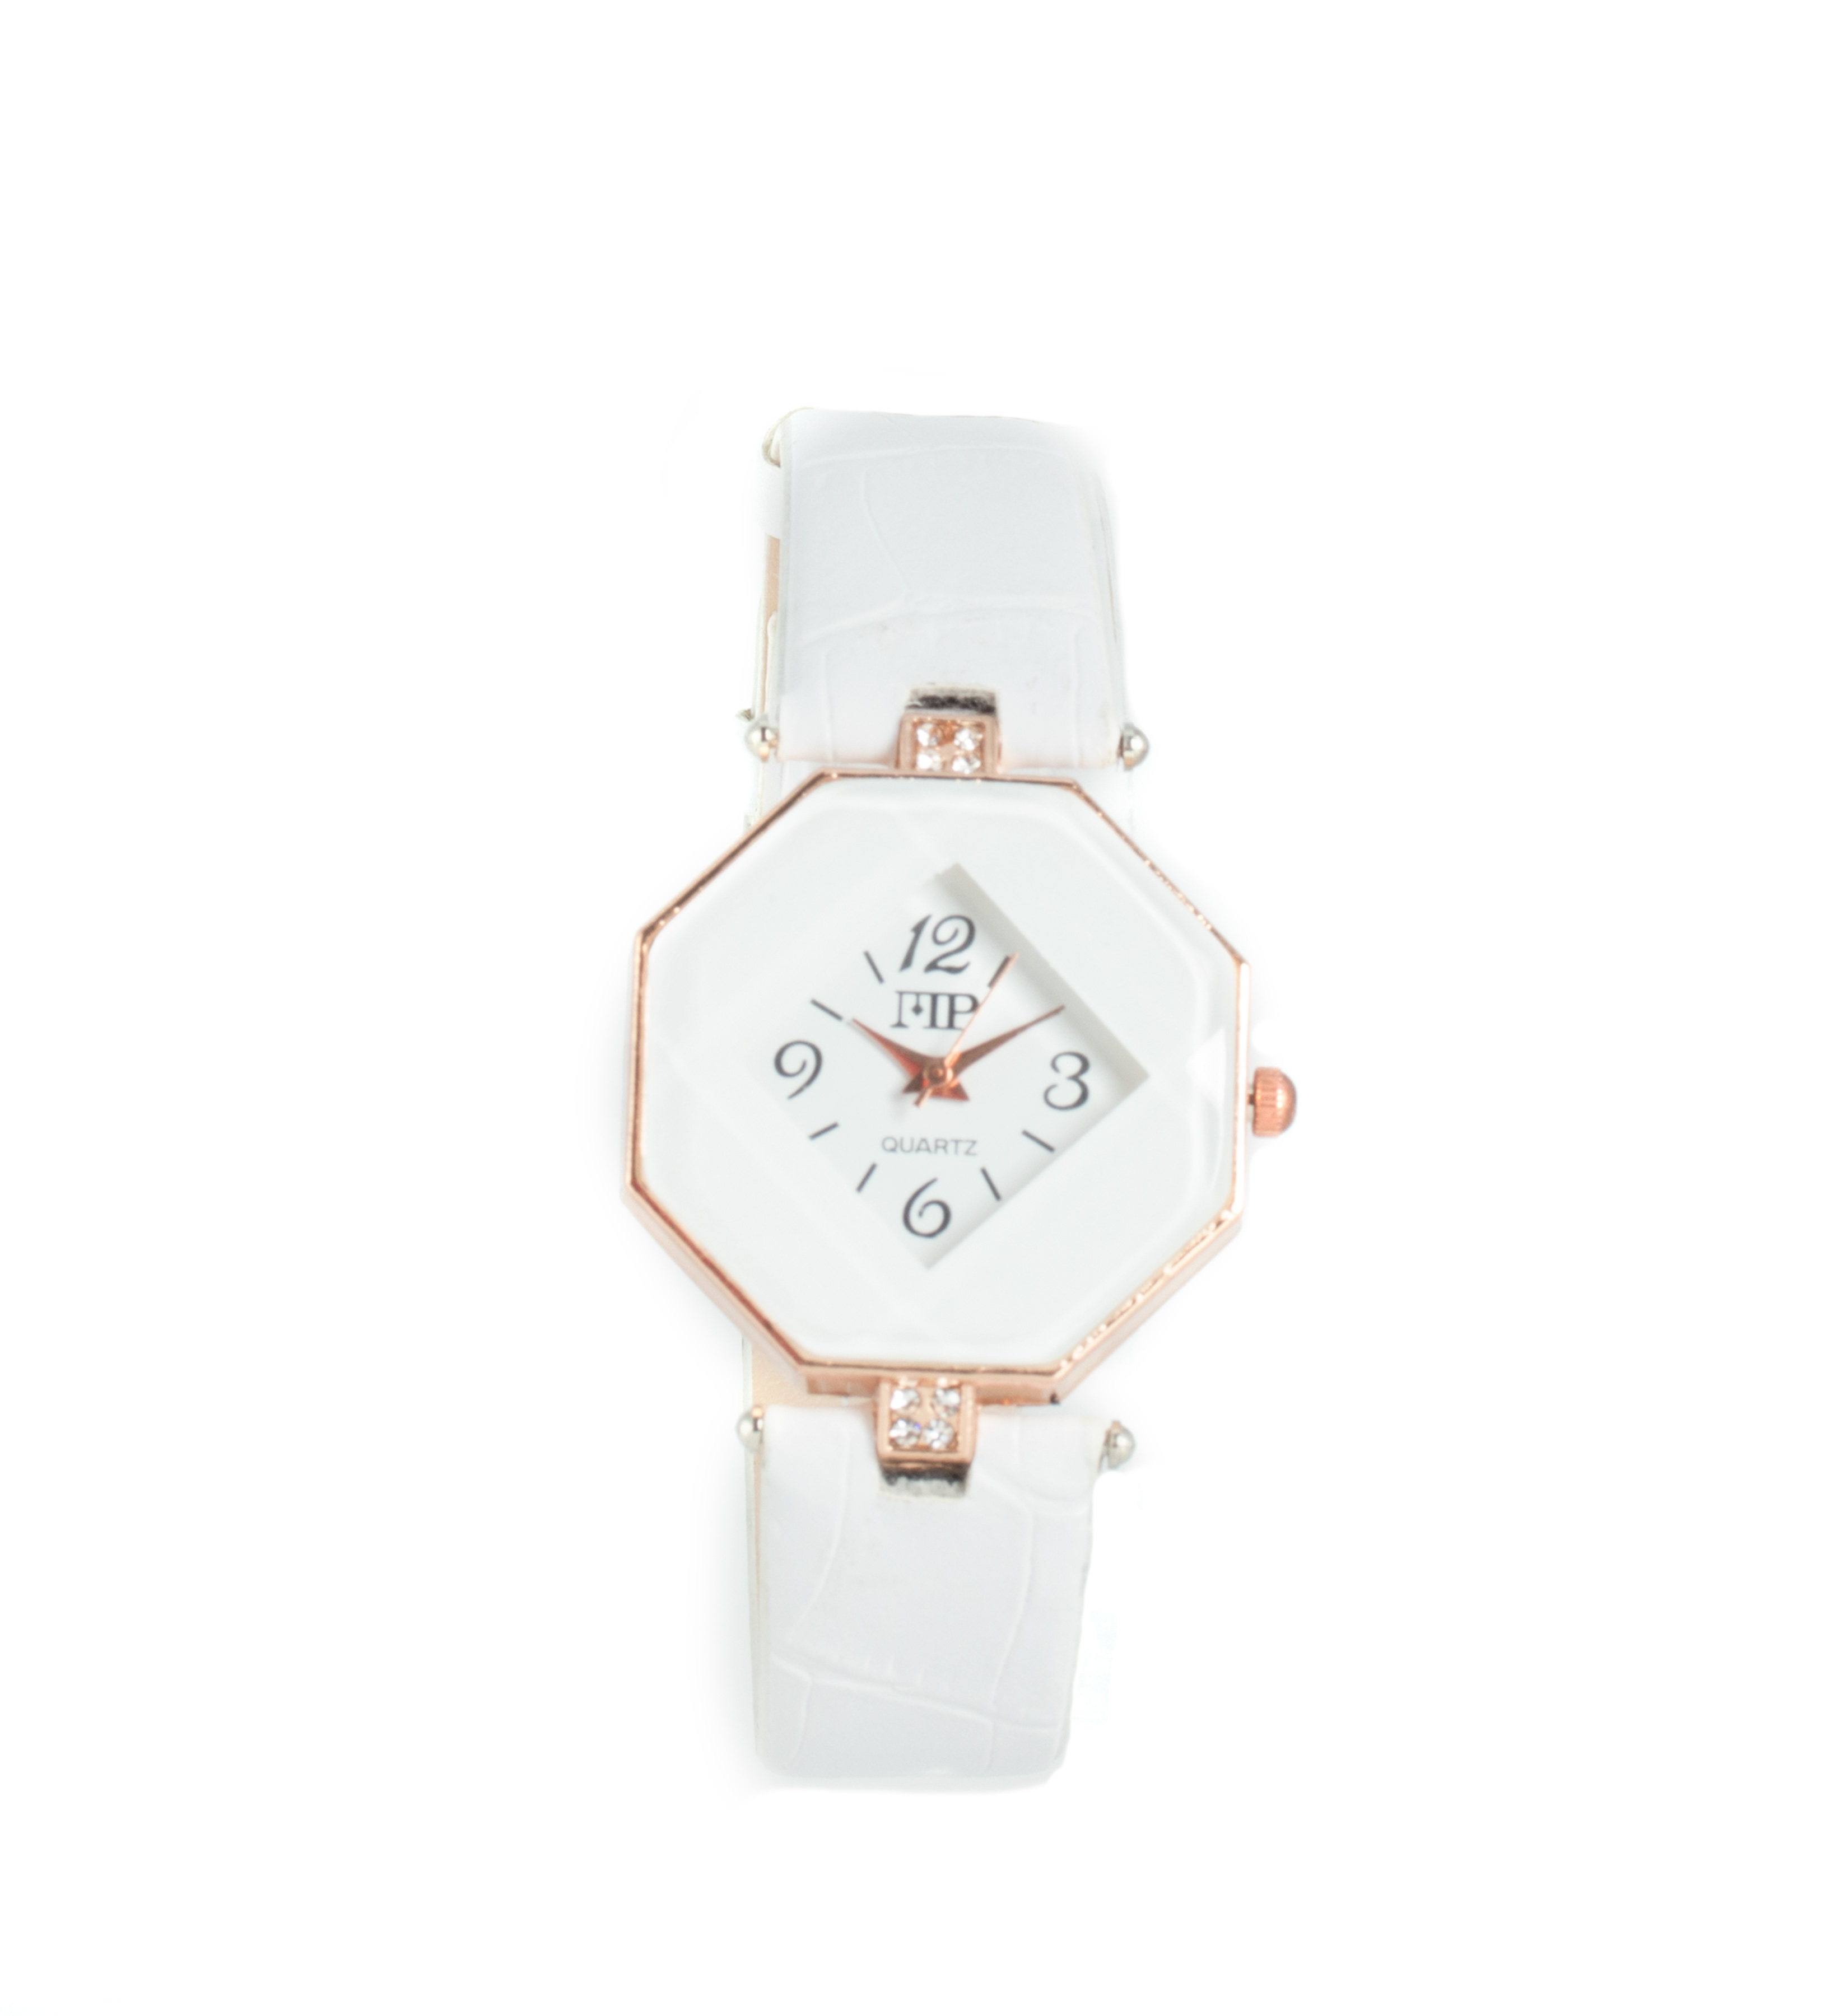 Comprar Marsan Piel Analogue clock Icky white